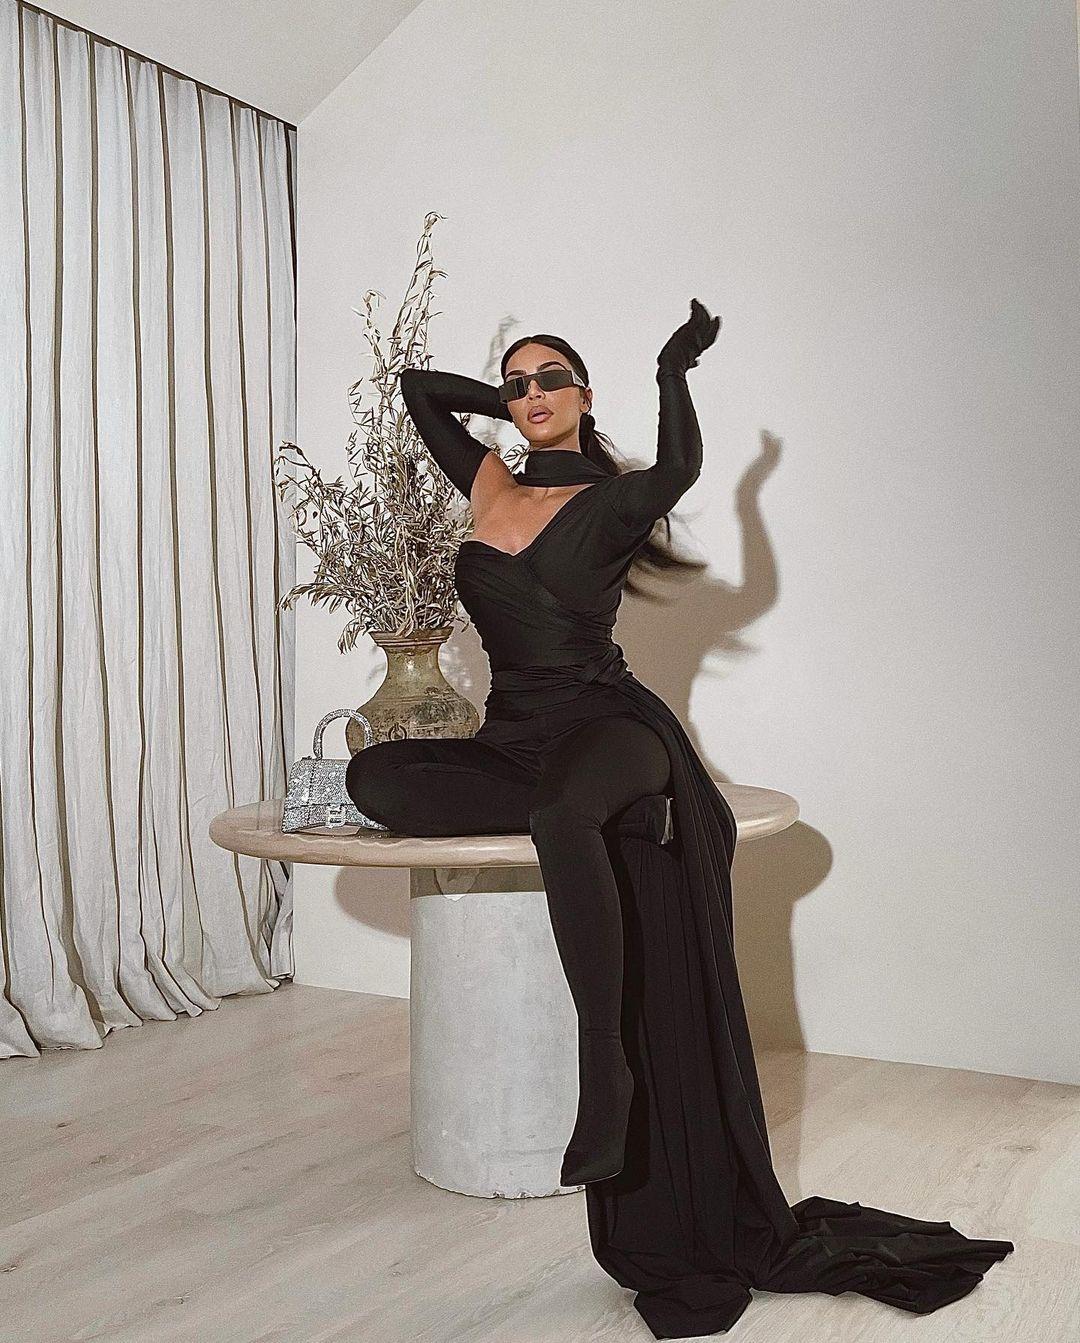 Kim Kardashian is In The Matrix! - Photo 2